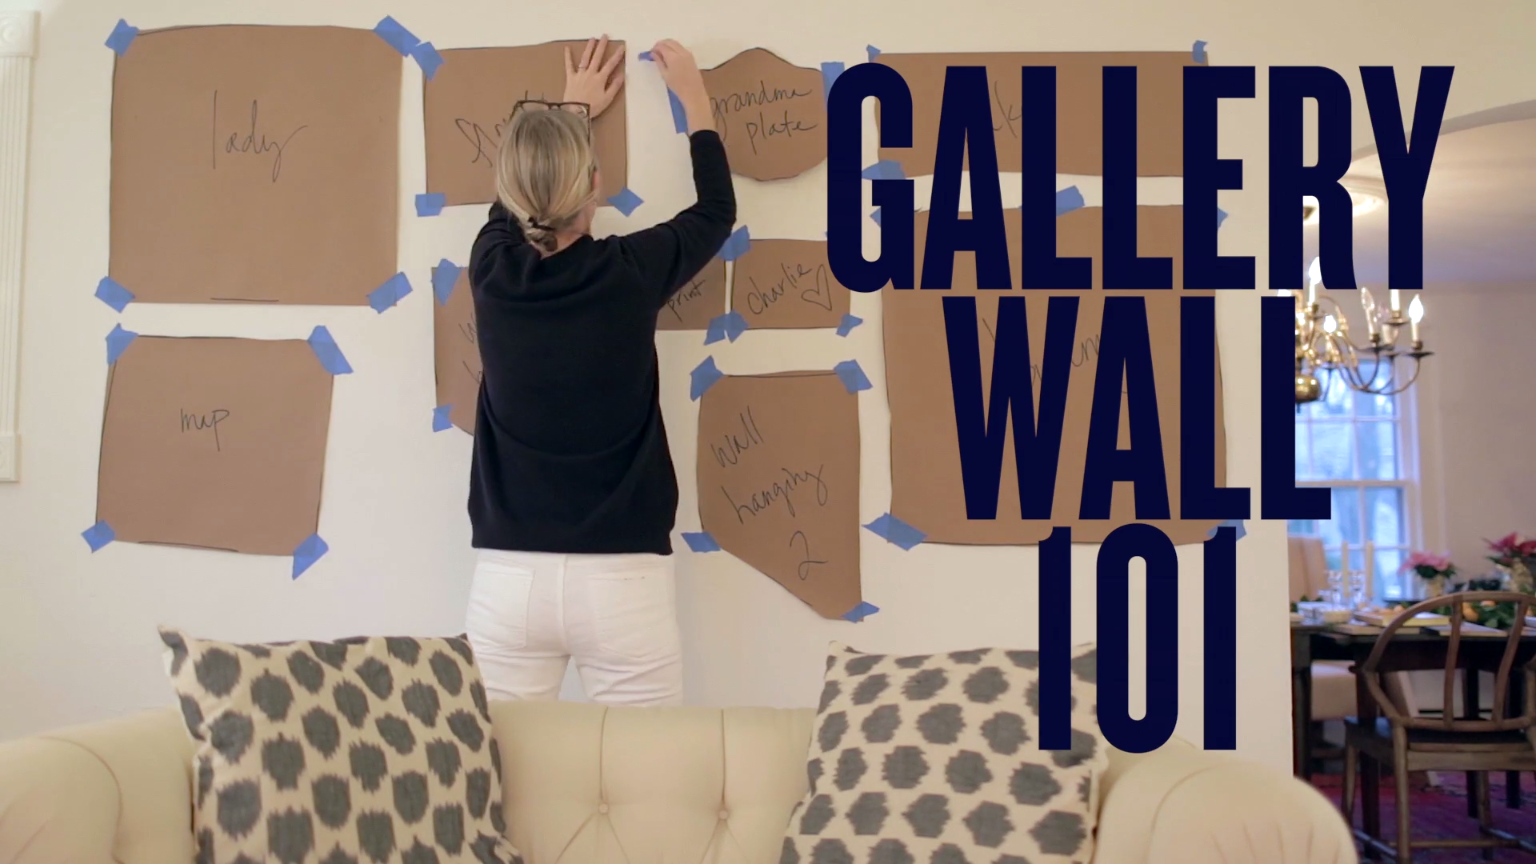 Interieur Inrichting Galerie : The trick to hanging a gallery wall huis inrichting muur en